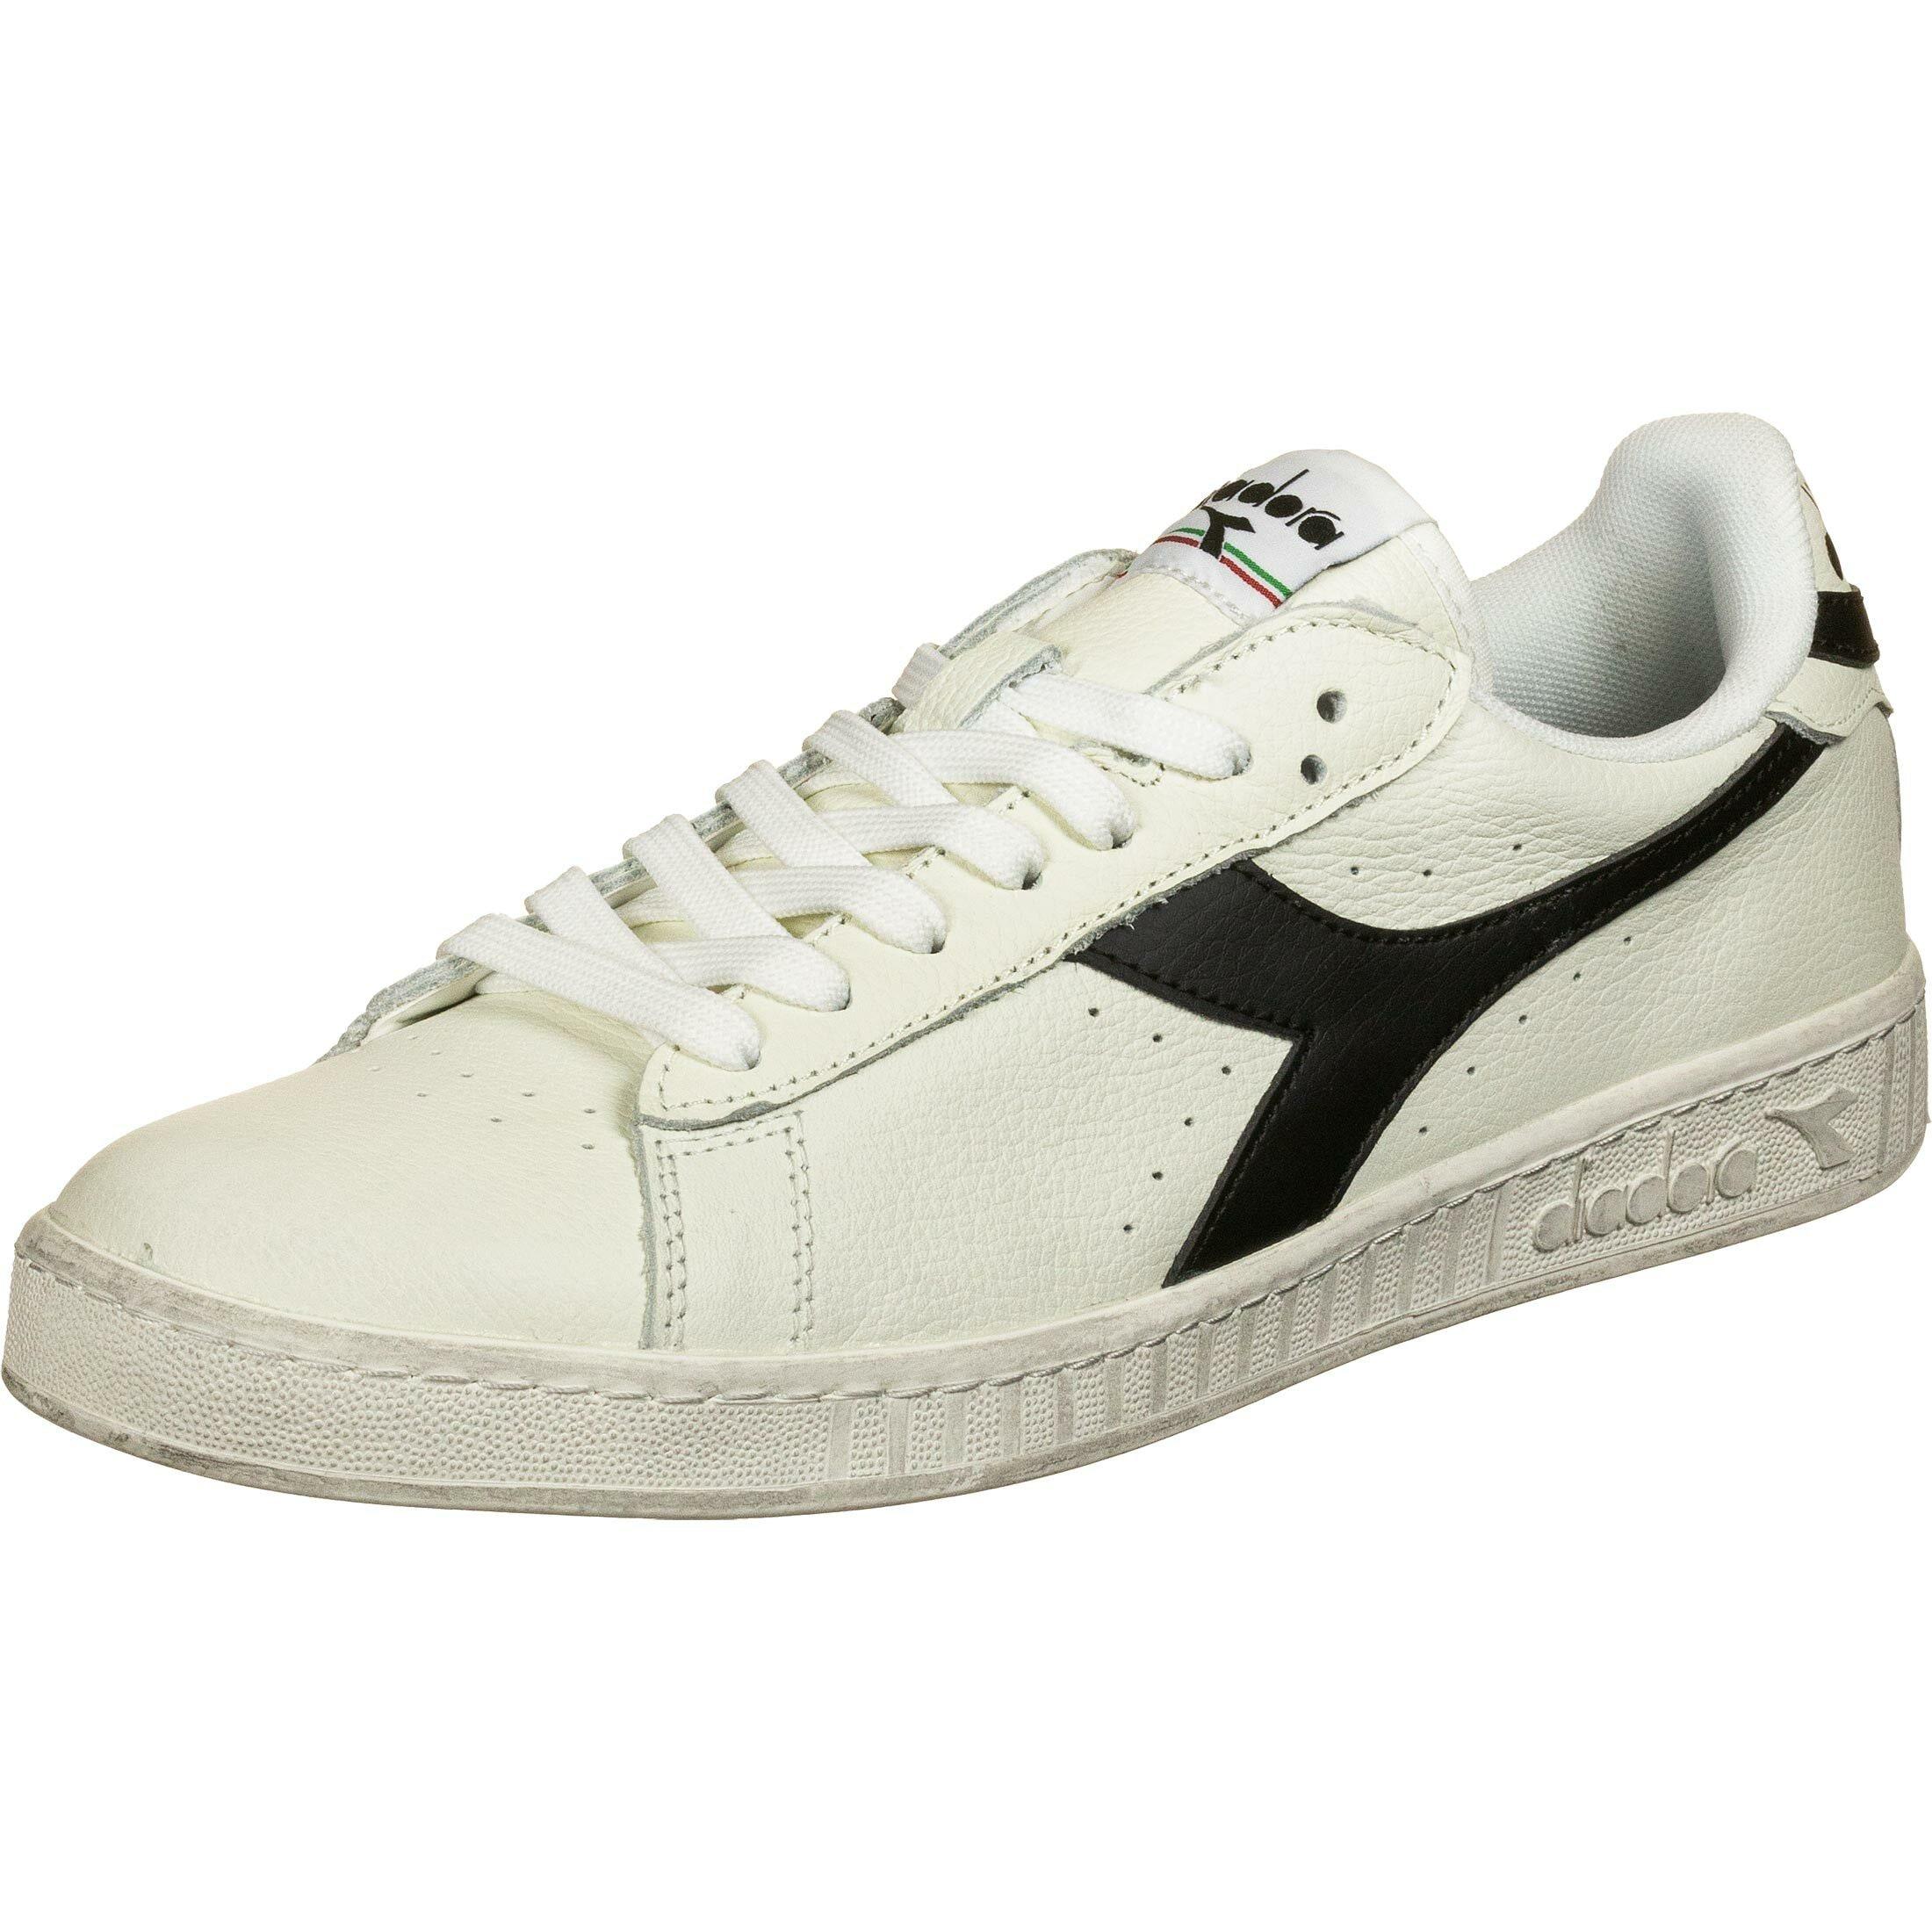 Diadora Sneaker Game L Low Waxed